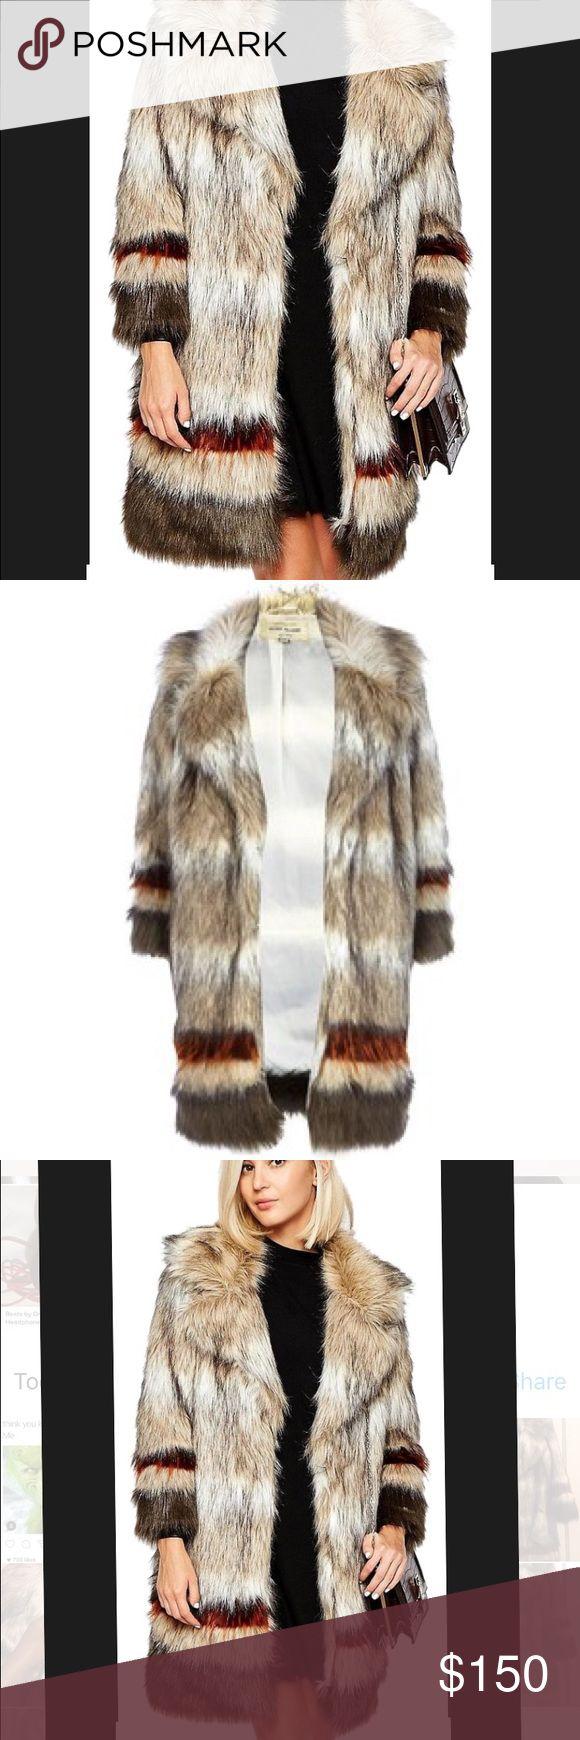 Beige Stripe by River Island Fur Coats Type:Coats Color:Multicolor Size:8 (M) Brand:River Island Style/Collection:River Island Stripe Faux Fur Coat Style Tags:River Island Coats River Island Jackets & Coats Blazers